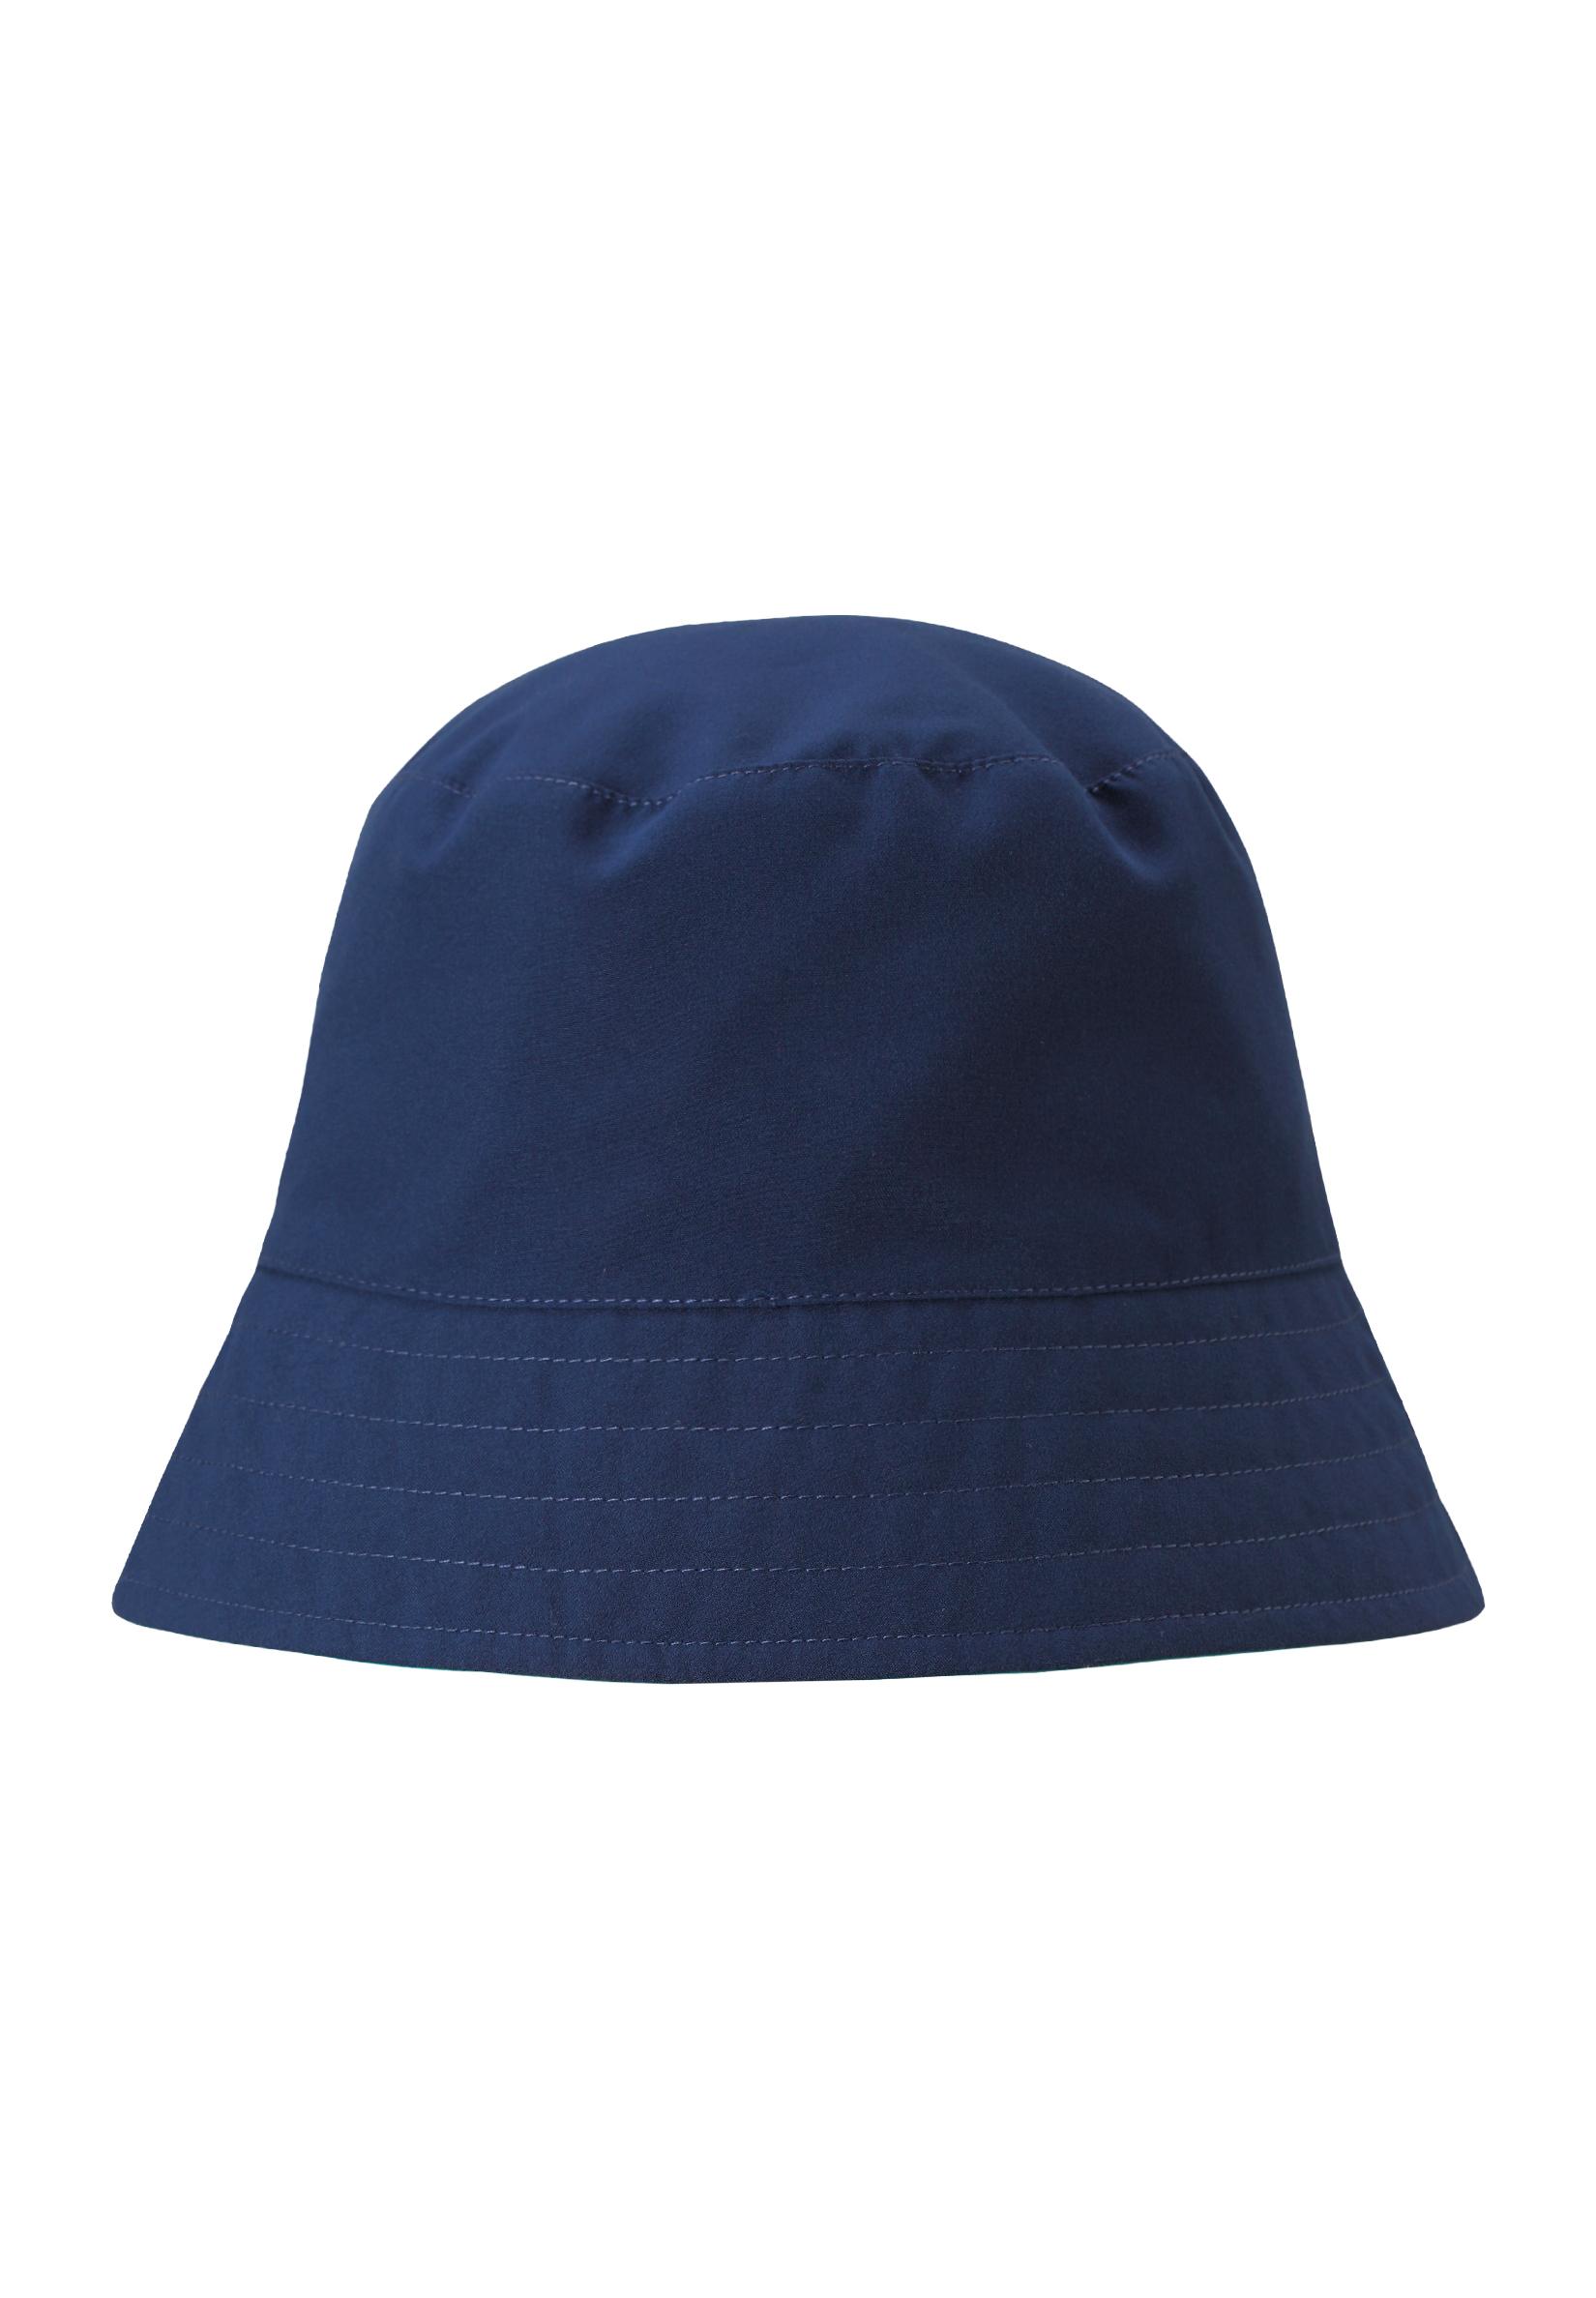 Reima Sonnenhut Viehe Navy blue